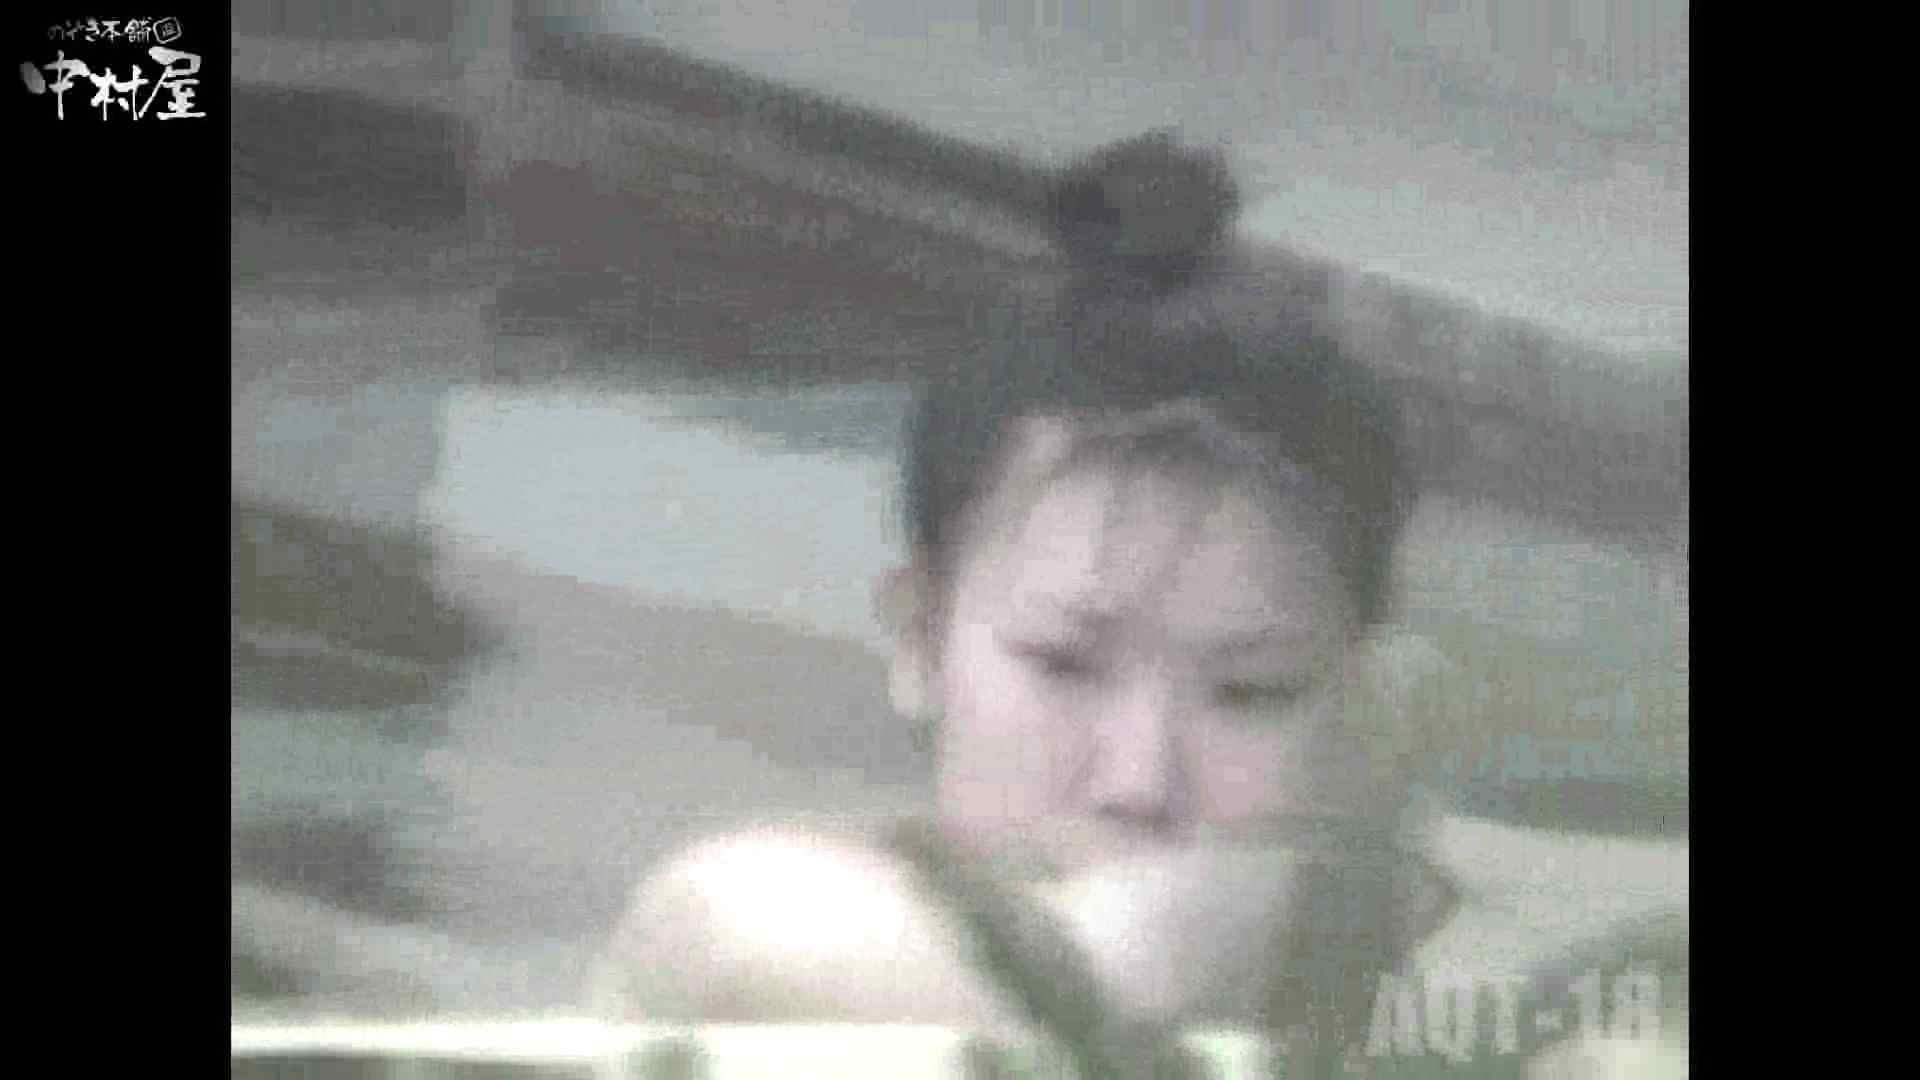 Aquaな露天風呂Vol.882潜入盗撮露天風呂十八判湯 其の二 潜入 | 露天風呂  39連発 5